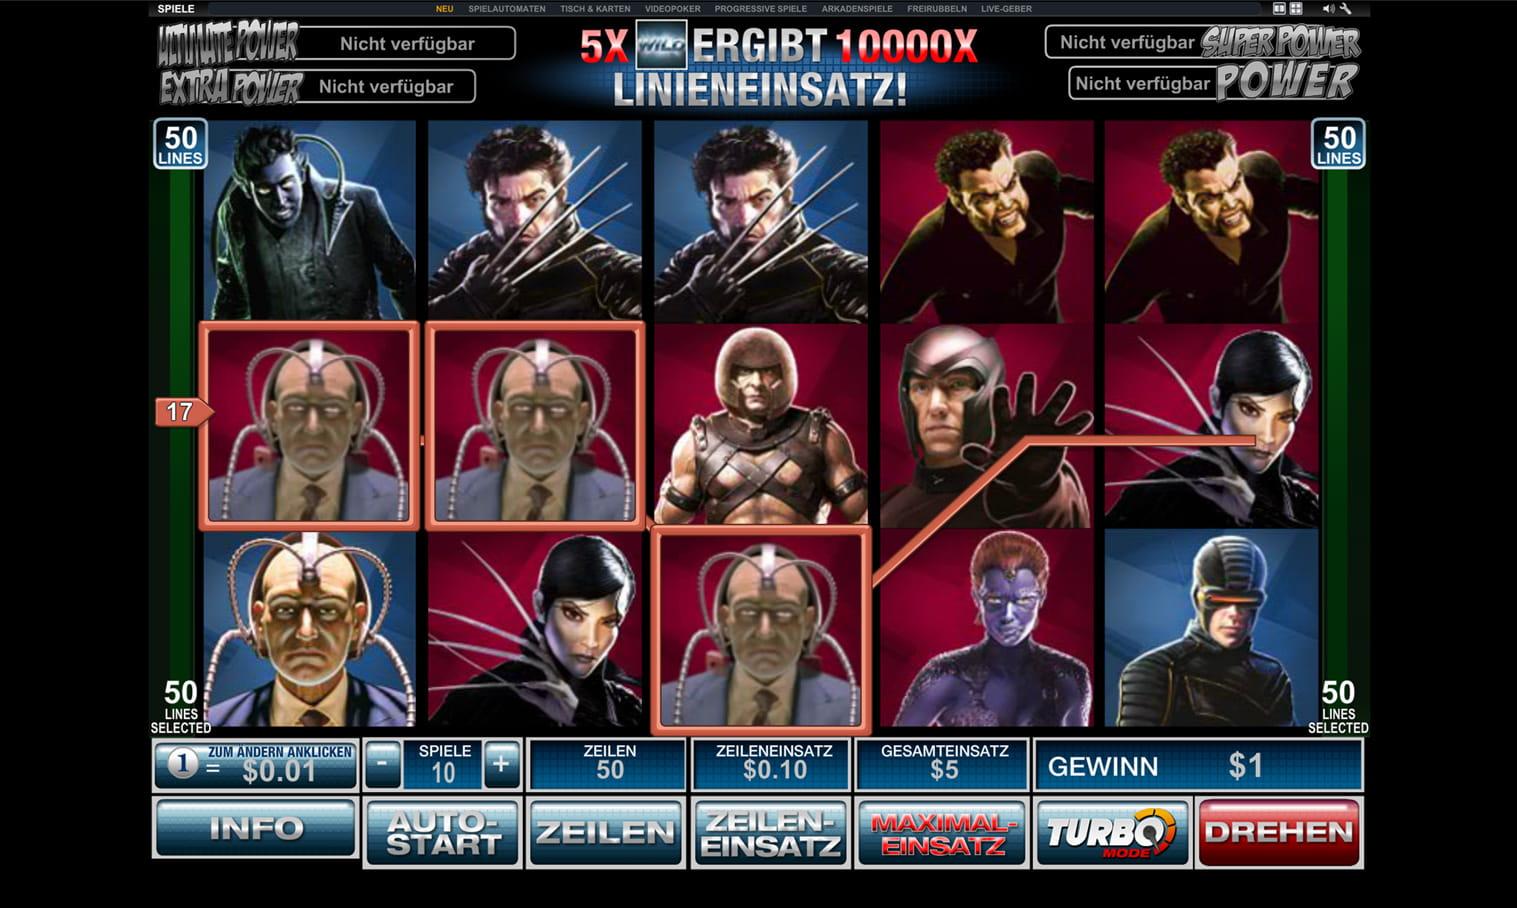 X Men Slots - Spielen Sie hier die X-Men-Slots gratis